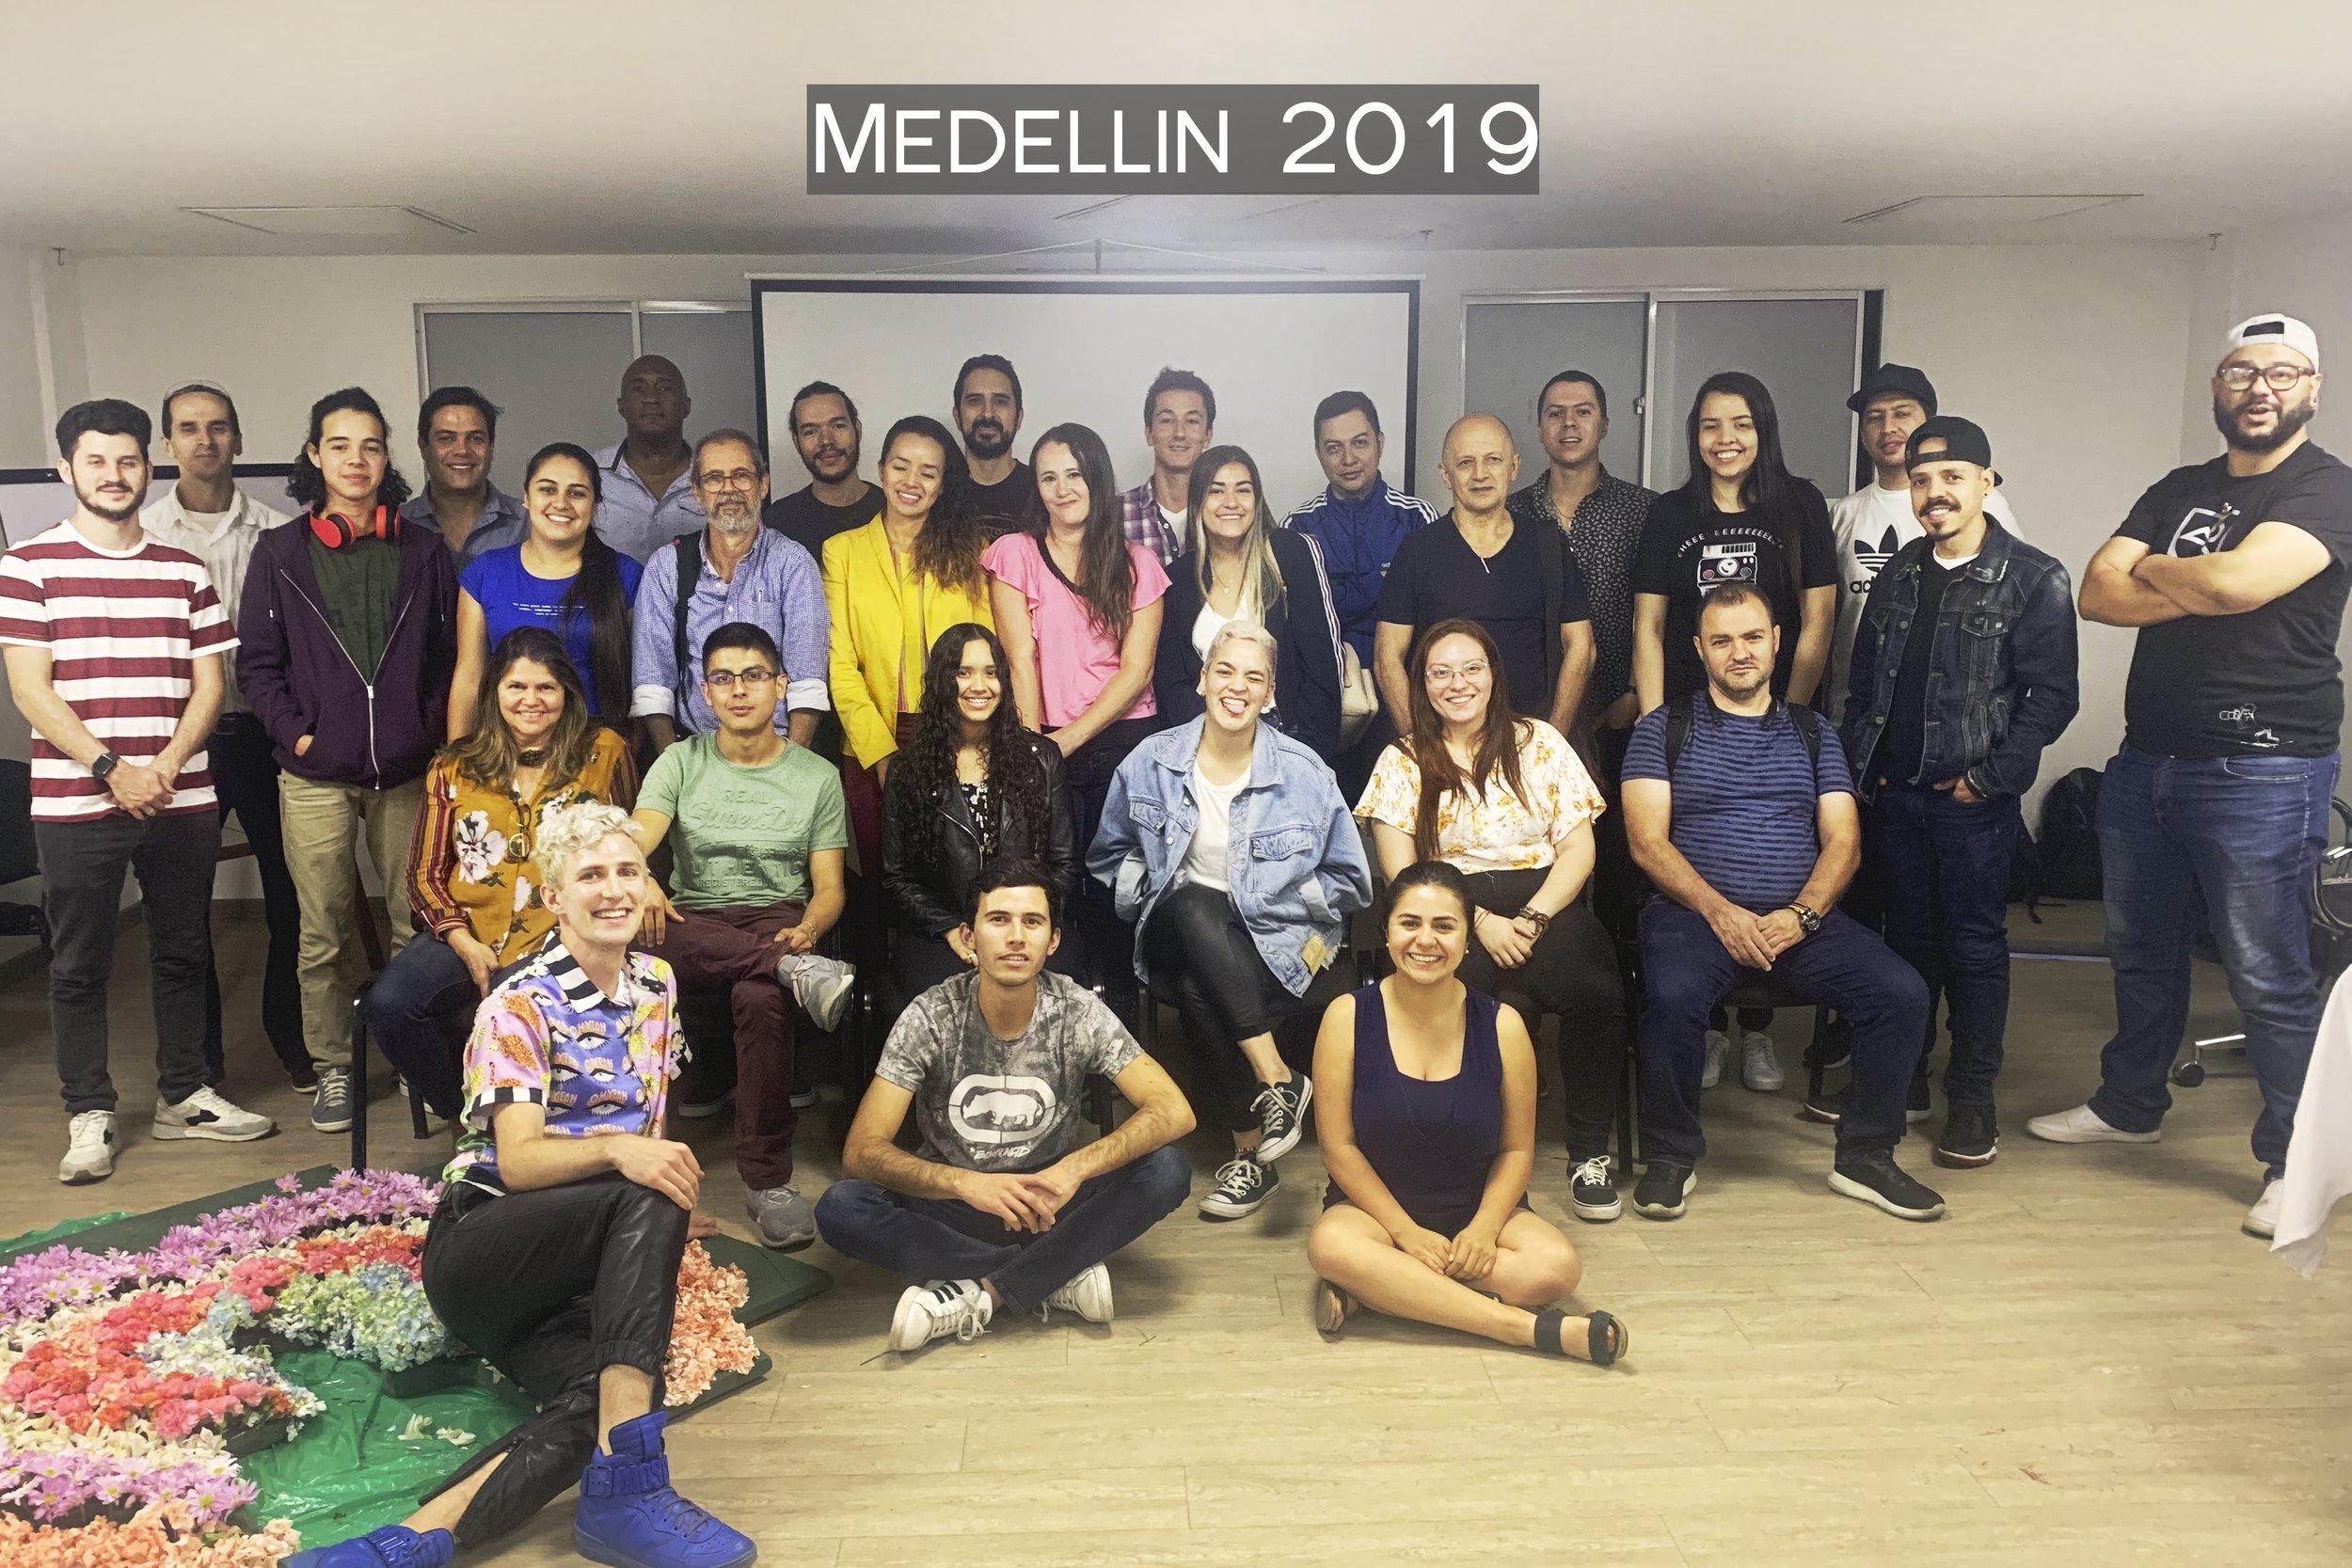 Medellin 2019.jpg